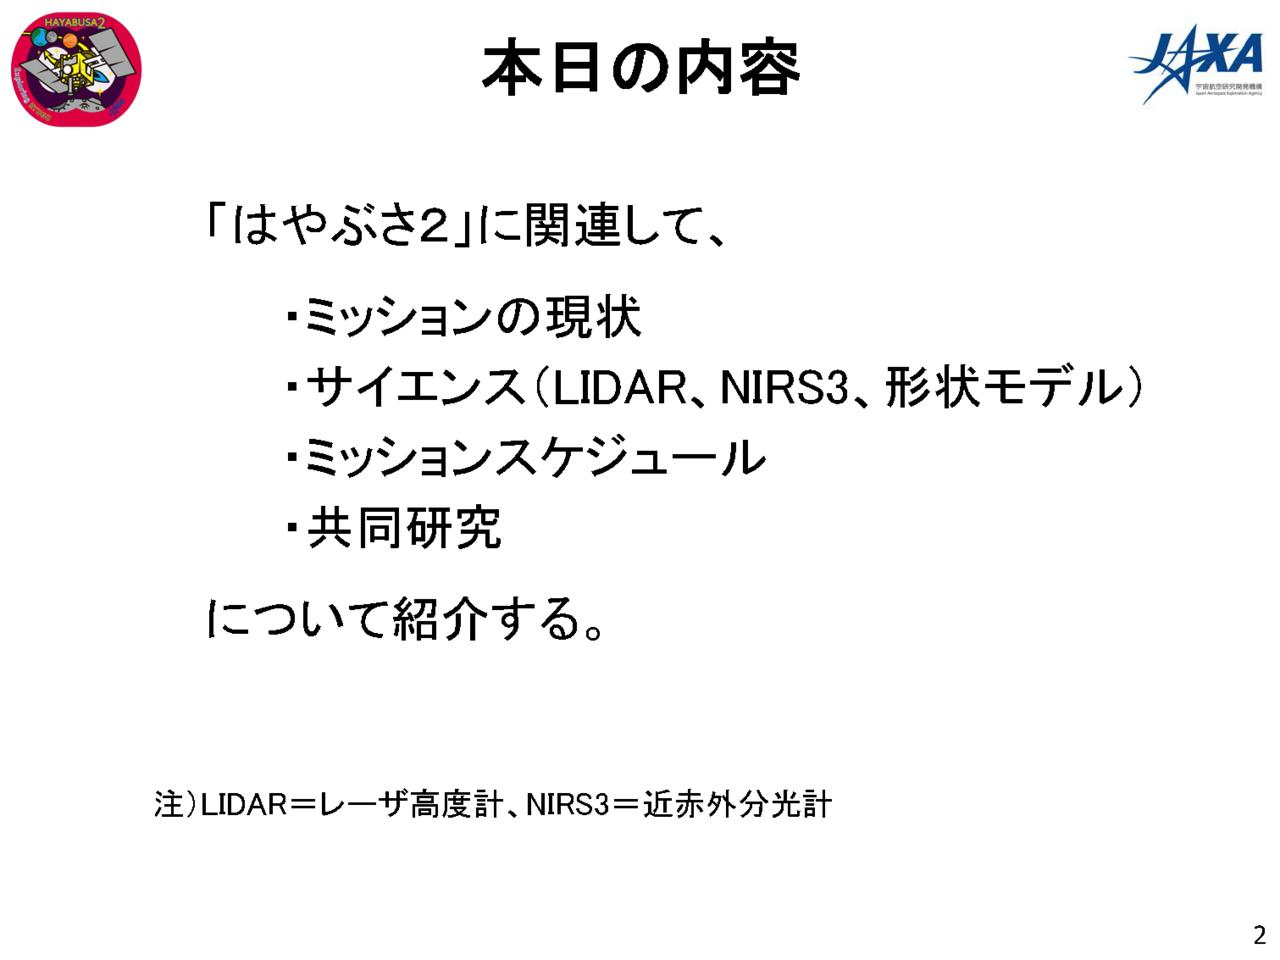 f:id:Imamura:20180802145922p:plain